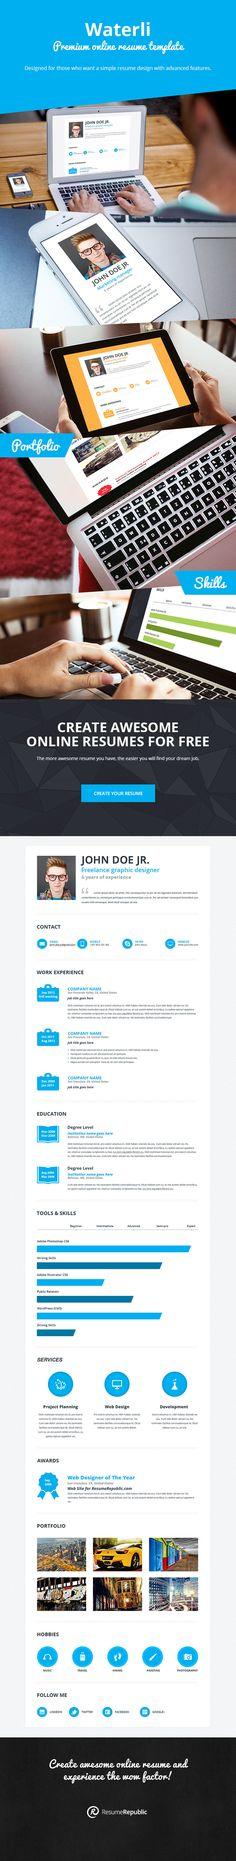 Waterli | Premium online resume template